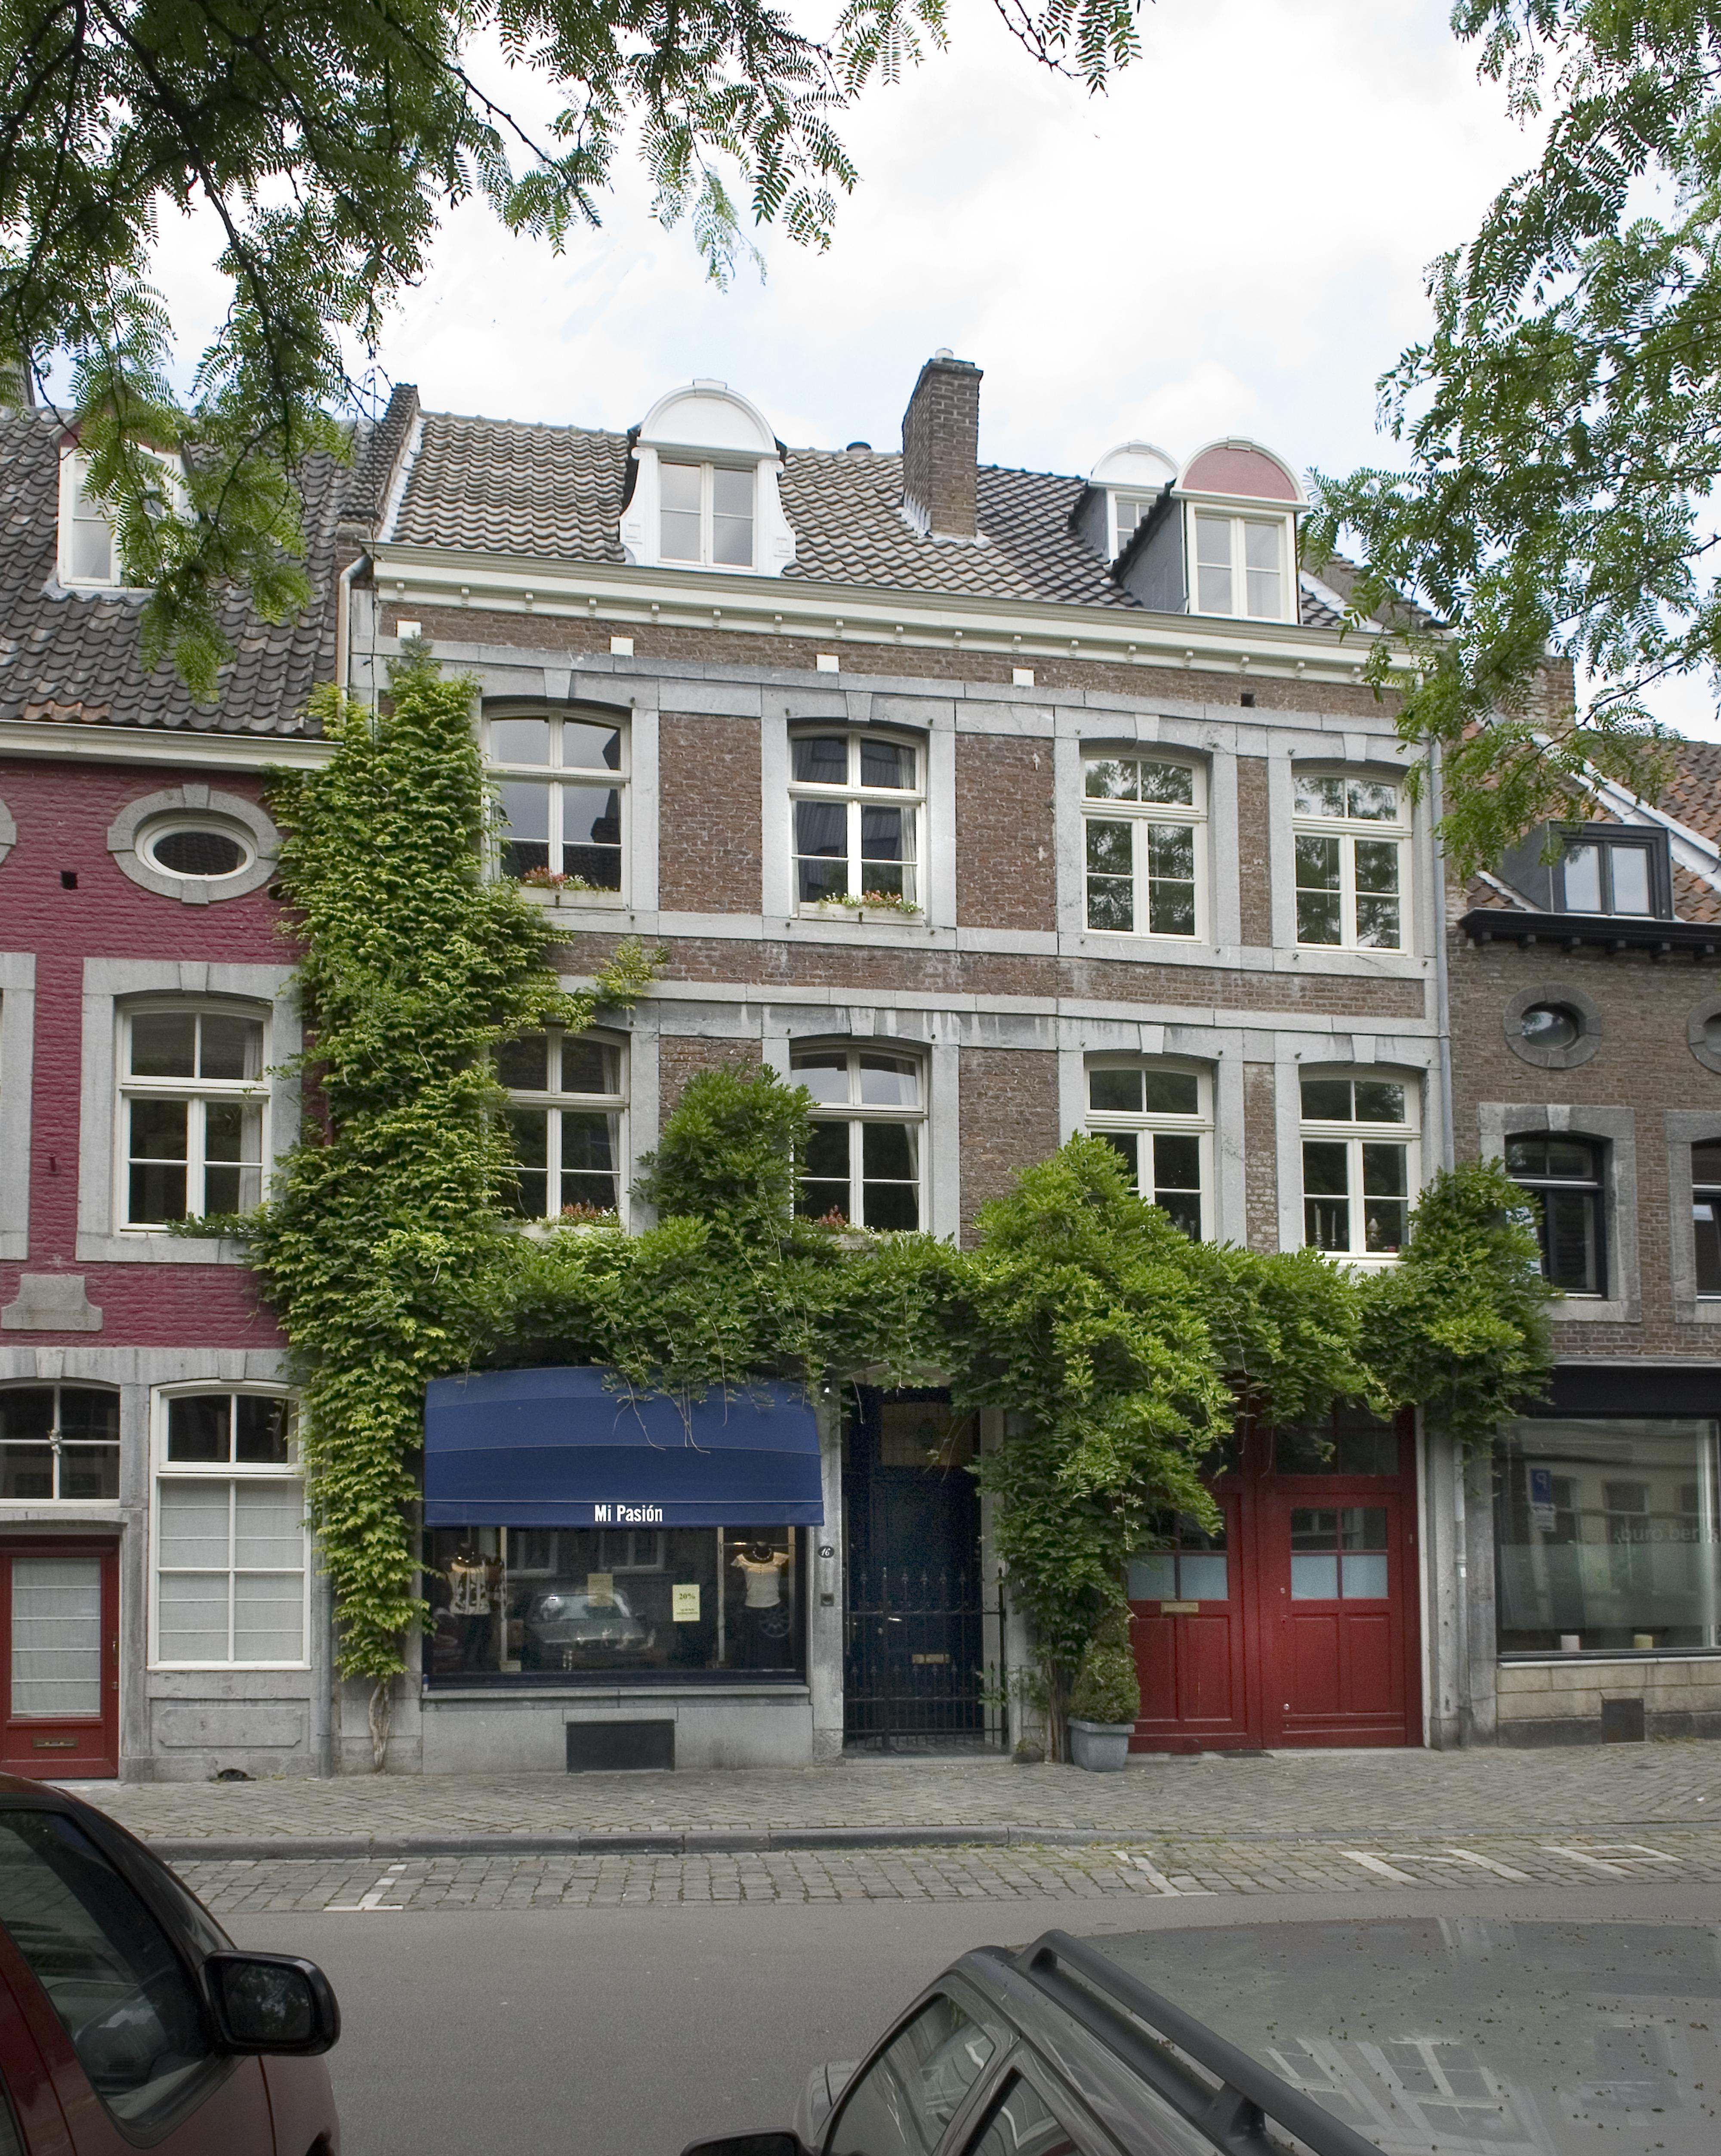 Maastricht, bonnefantenmuseum, vrijthof, hotel, 'boutique hotel', overnachten, overnachting,Keuken, tuin, binnentuin, garden, summergarden, kitchen, auliondor, B&B, breakfast, 'bed and breakfast',  'bed & breakfast', 'b&b', chambre d'haute, ontbijt